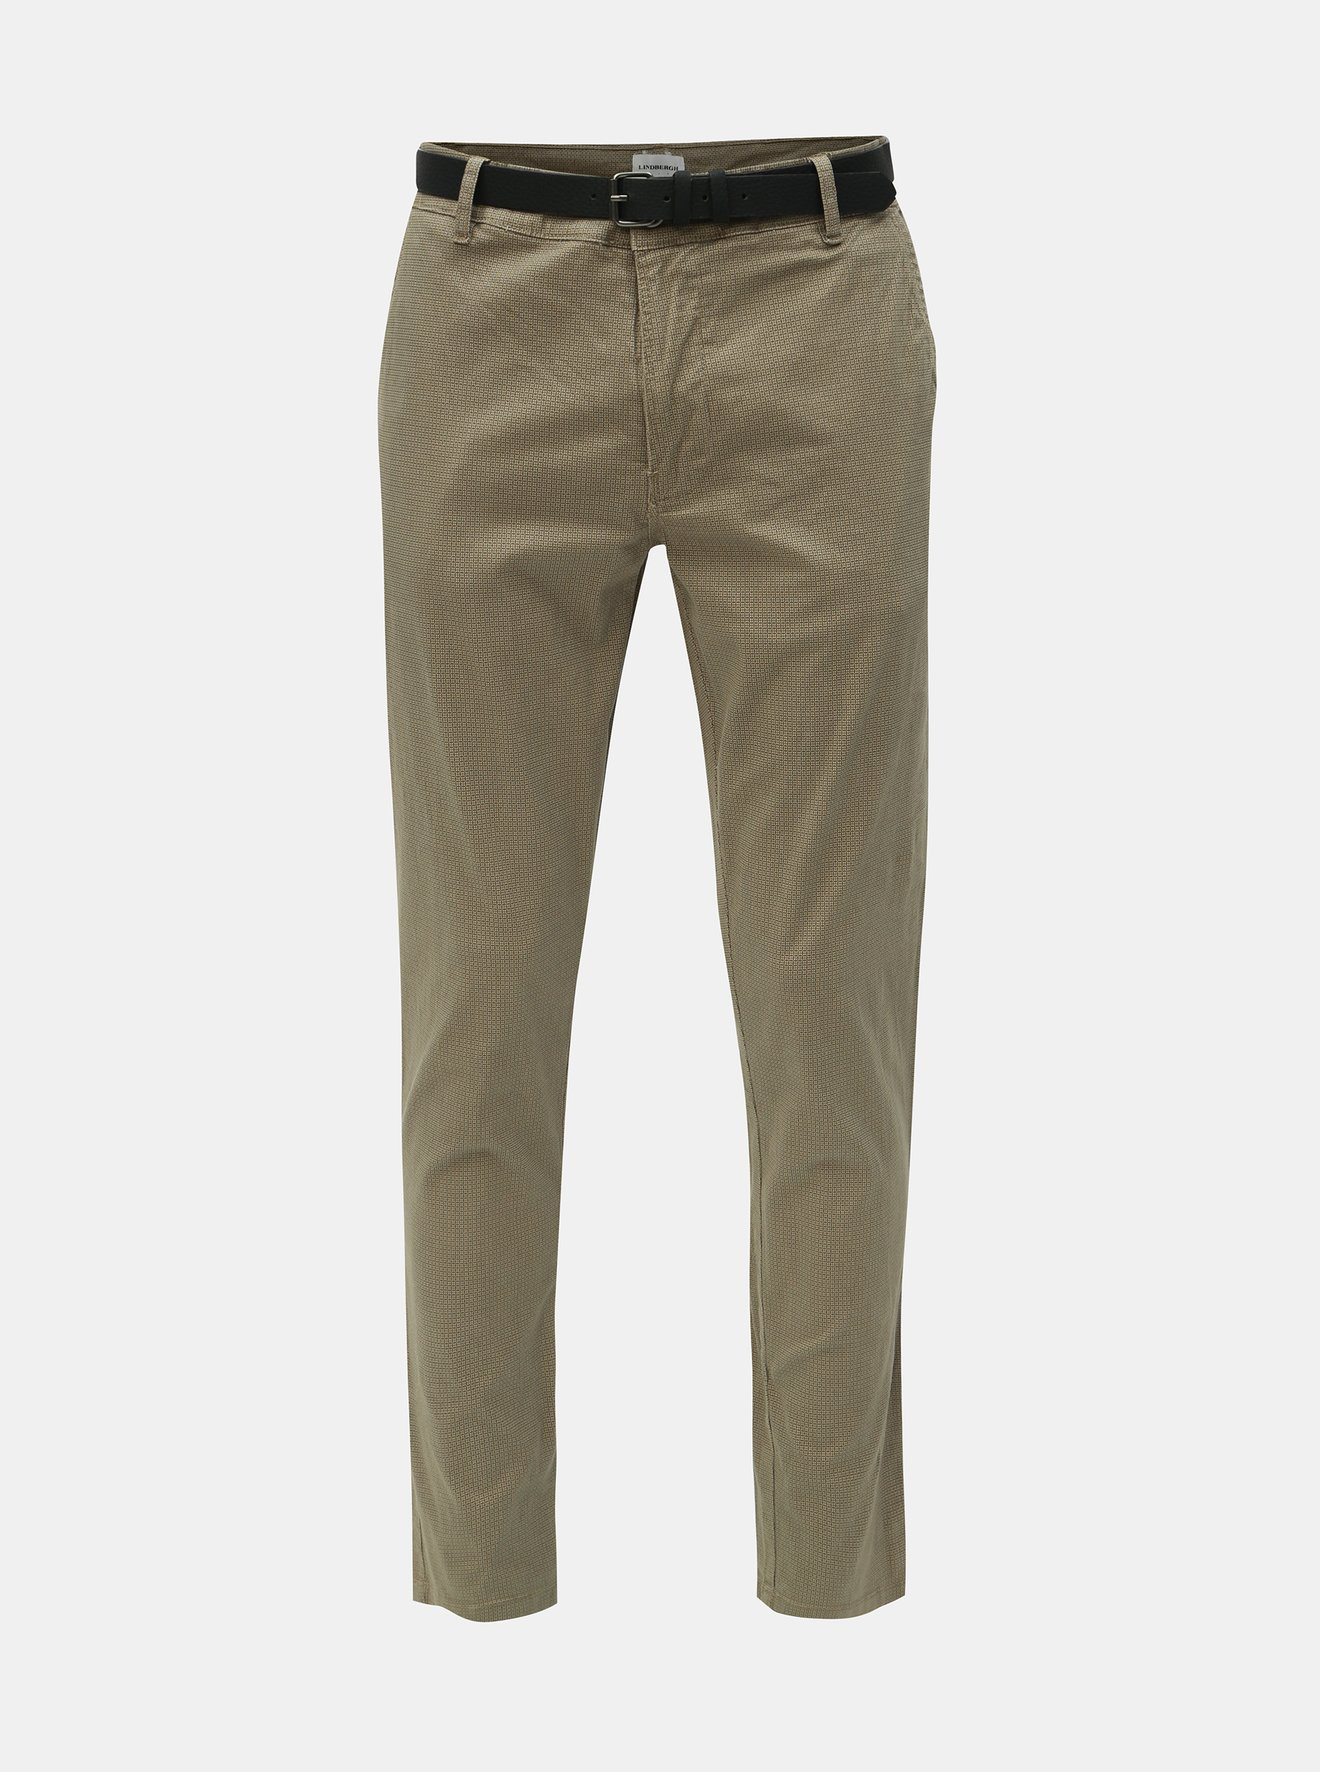 Béžové chino kalhoty s páskem Lindbergh